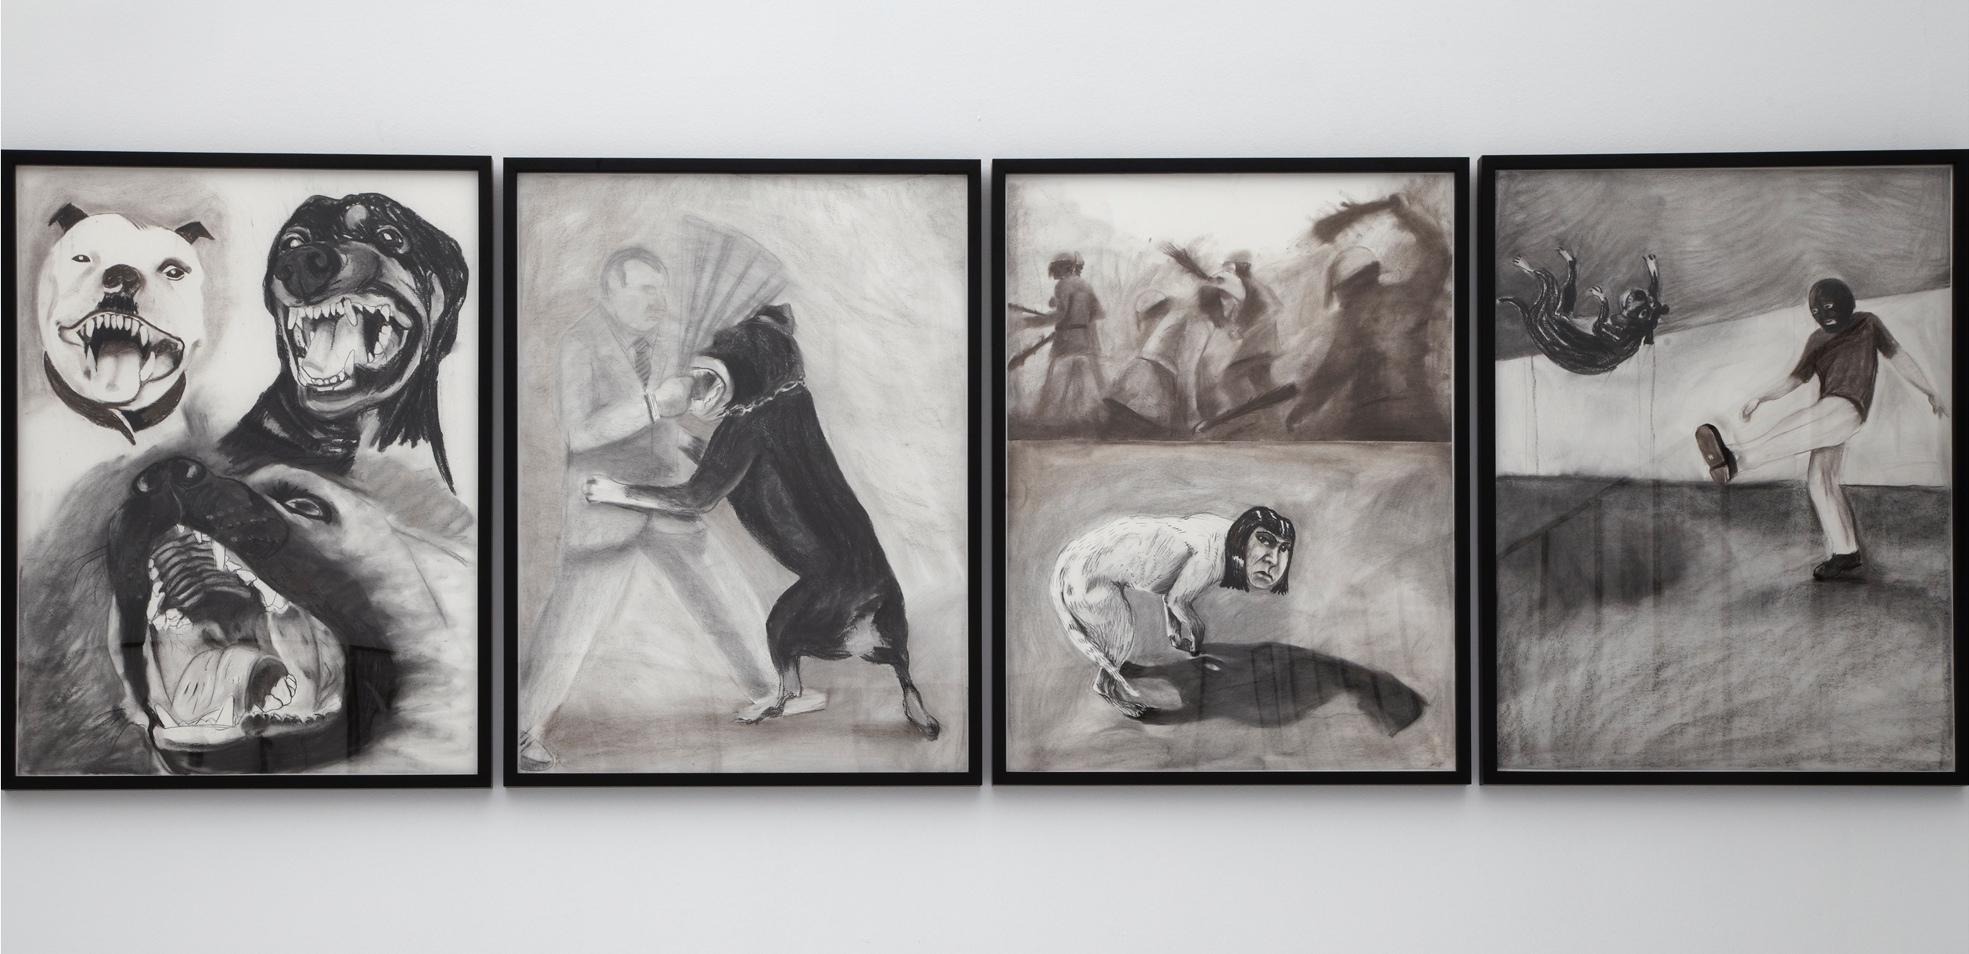 Juan Pérez Agirregoikoa (2012) - ¿Queréis un amo? ¡Lo-tendréis|